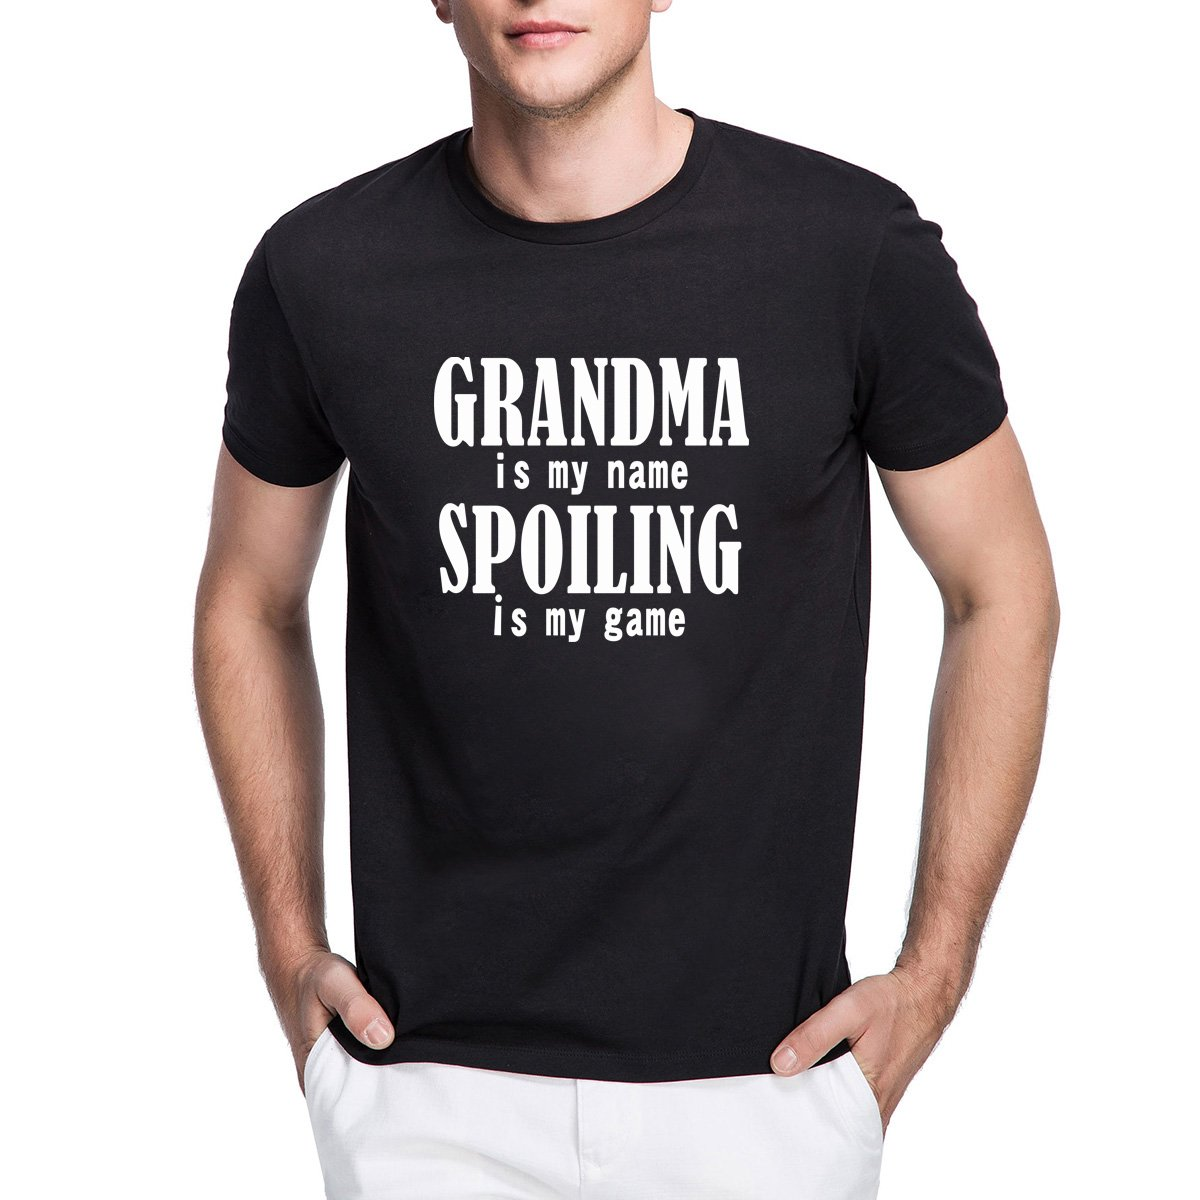 Loo Show Grandma Is My Name Funny Crew Short Sleeve T Shirts Casual Tee